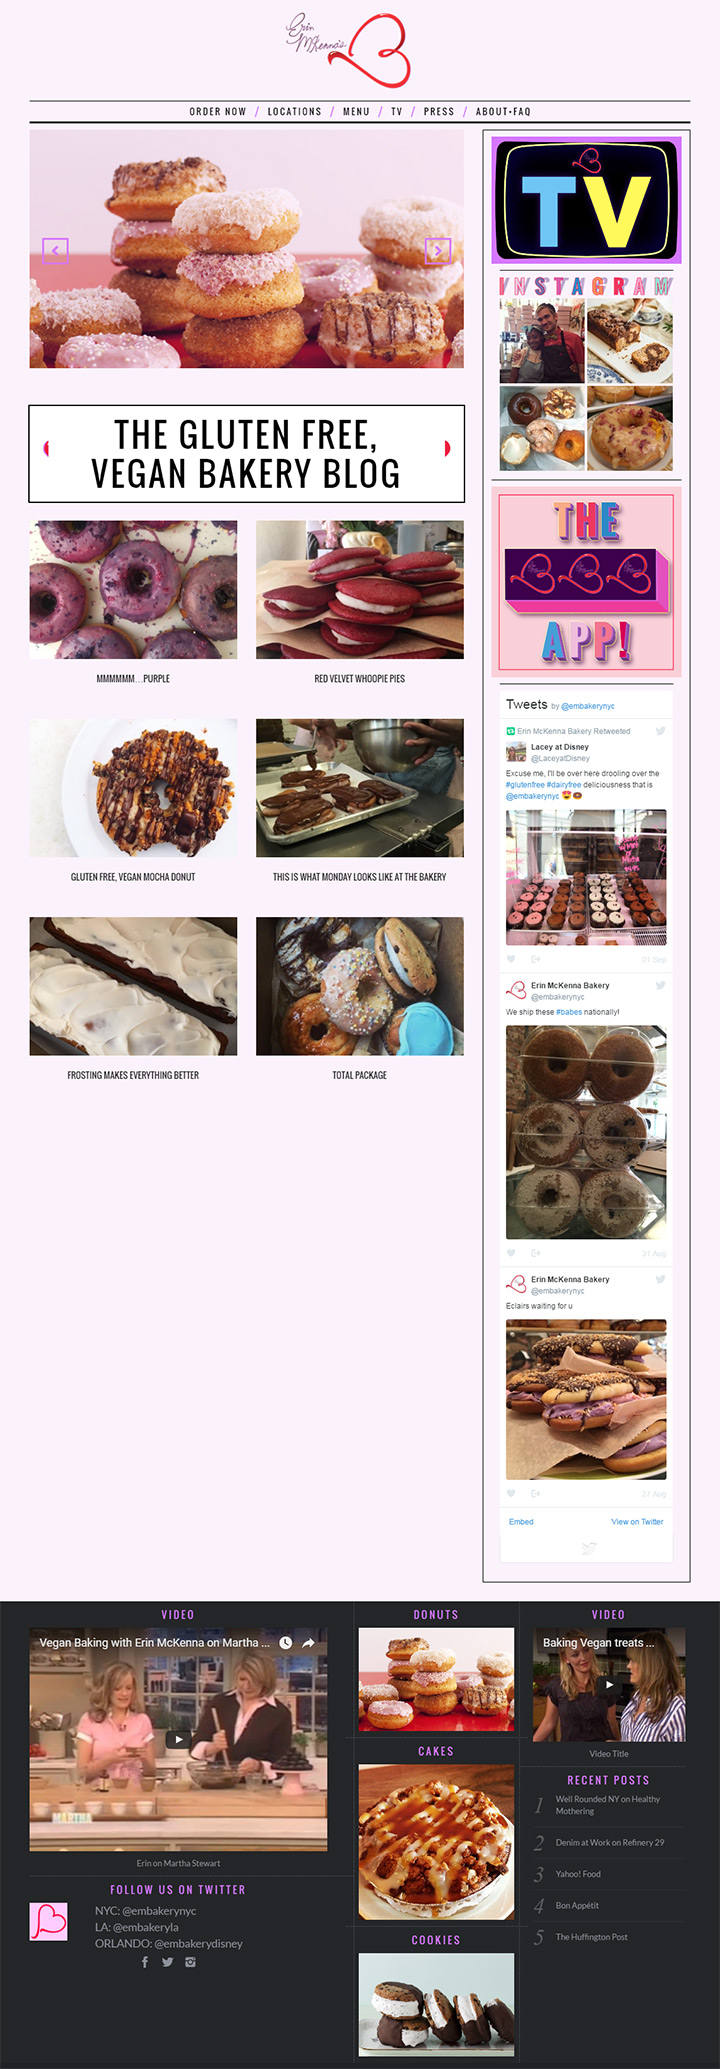 erin mckenna bakery